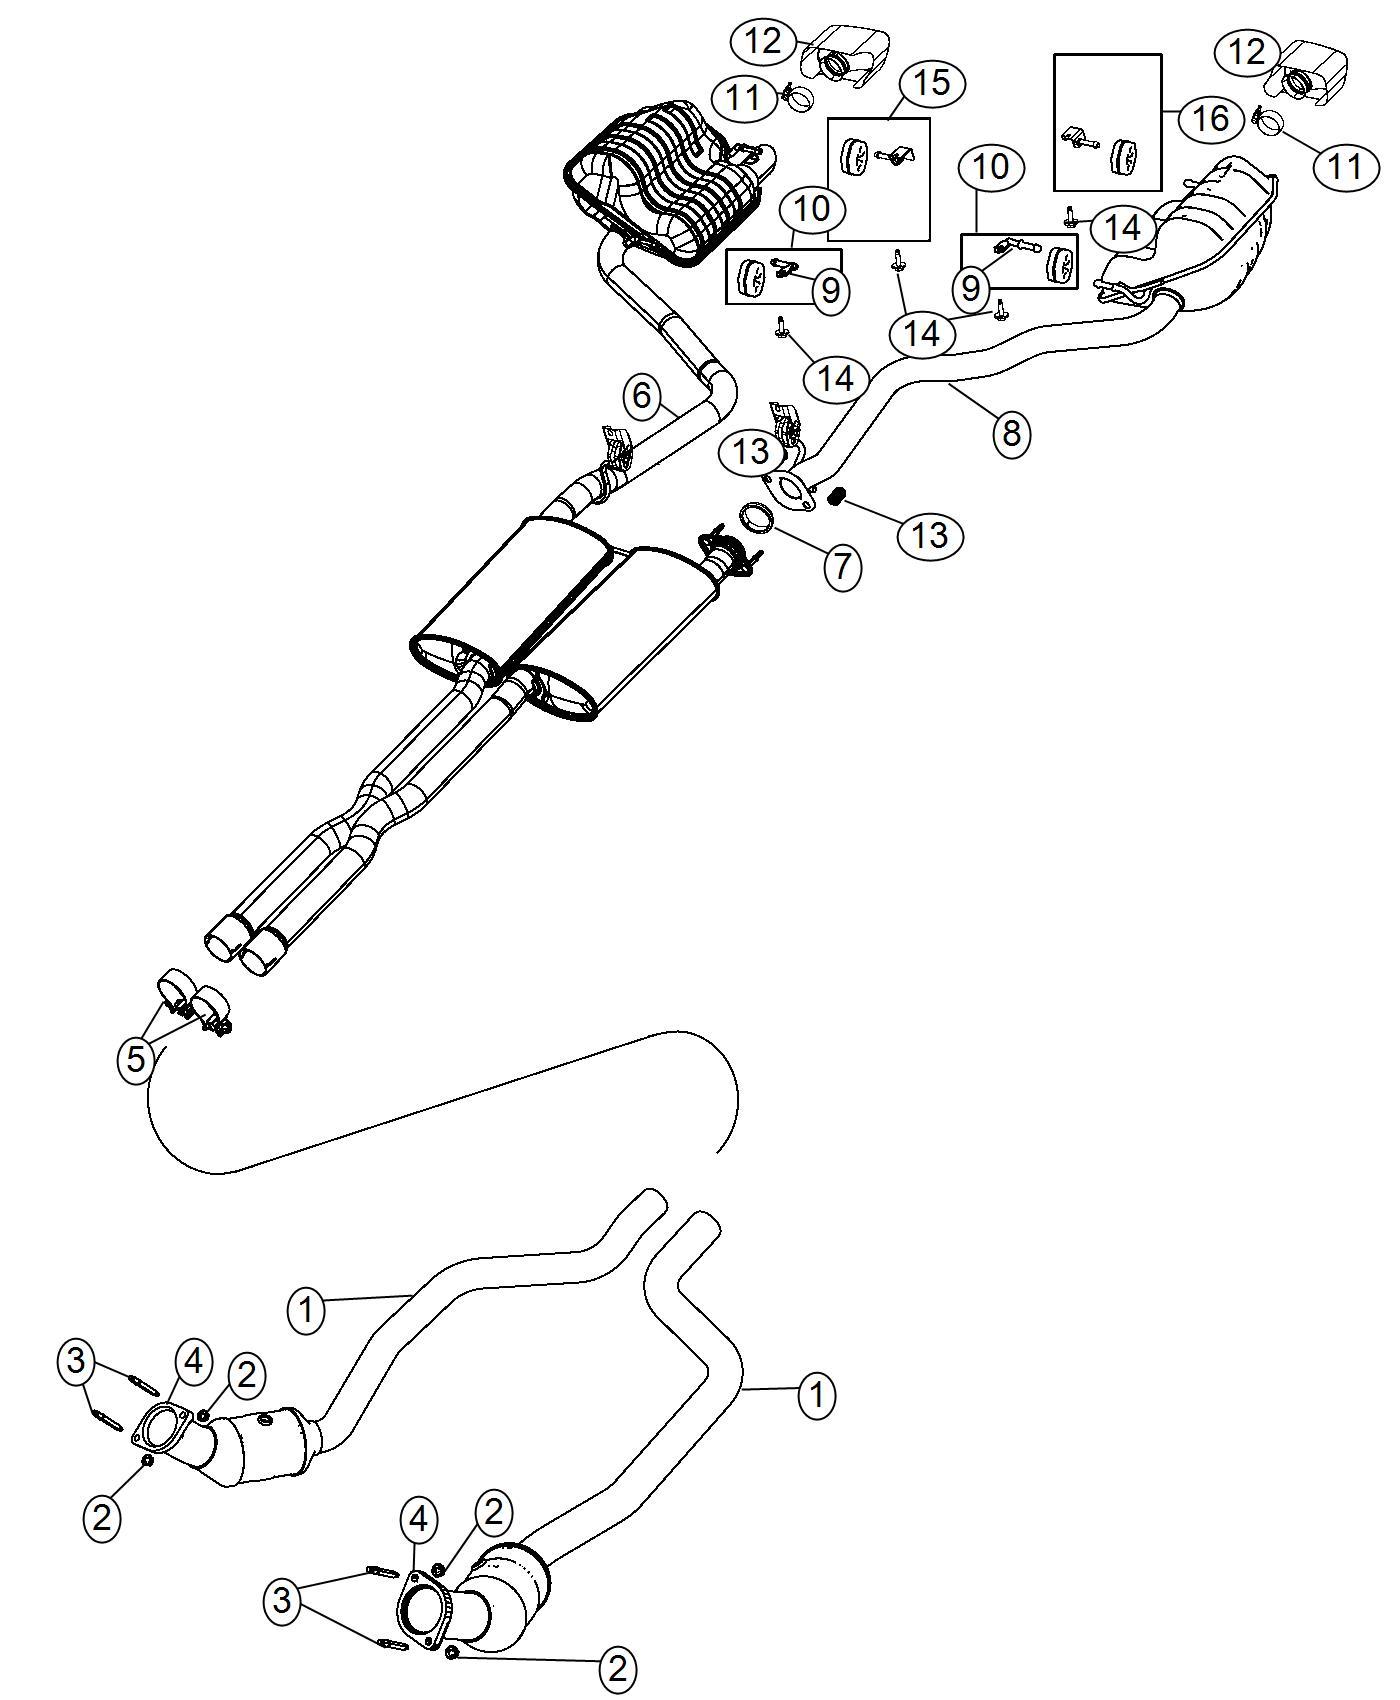 Dodge Challenger Used For Muffler And Resonator